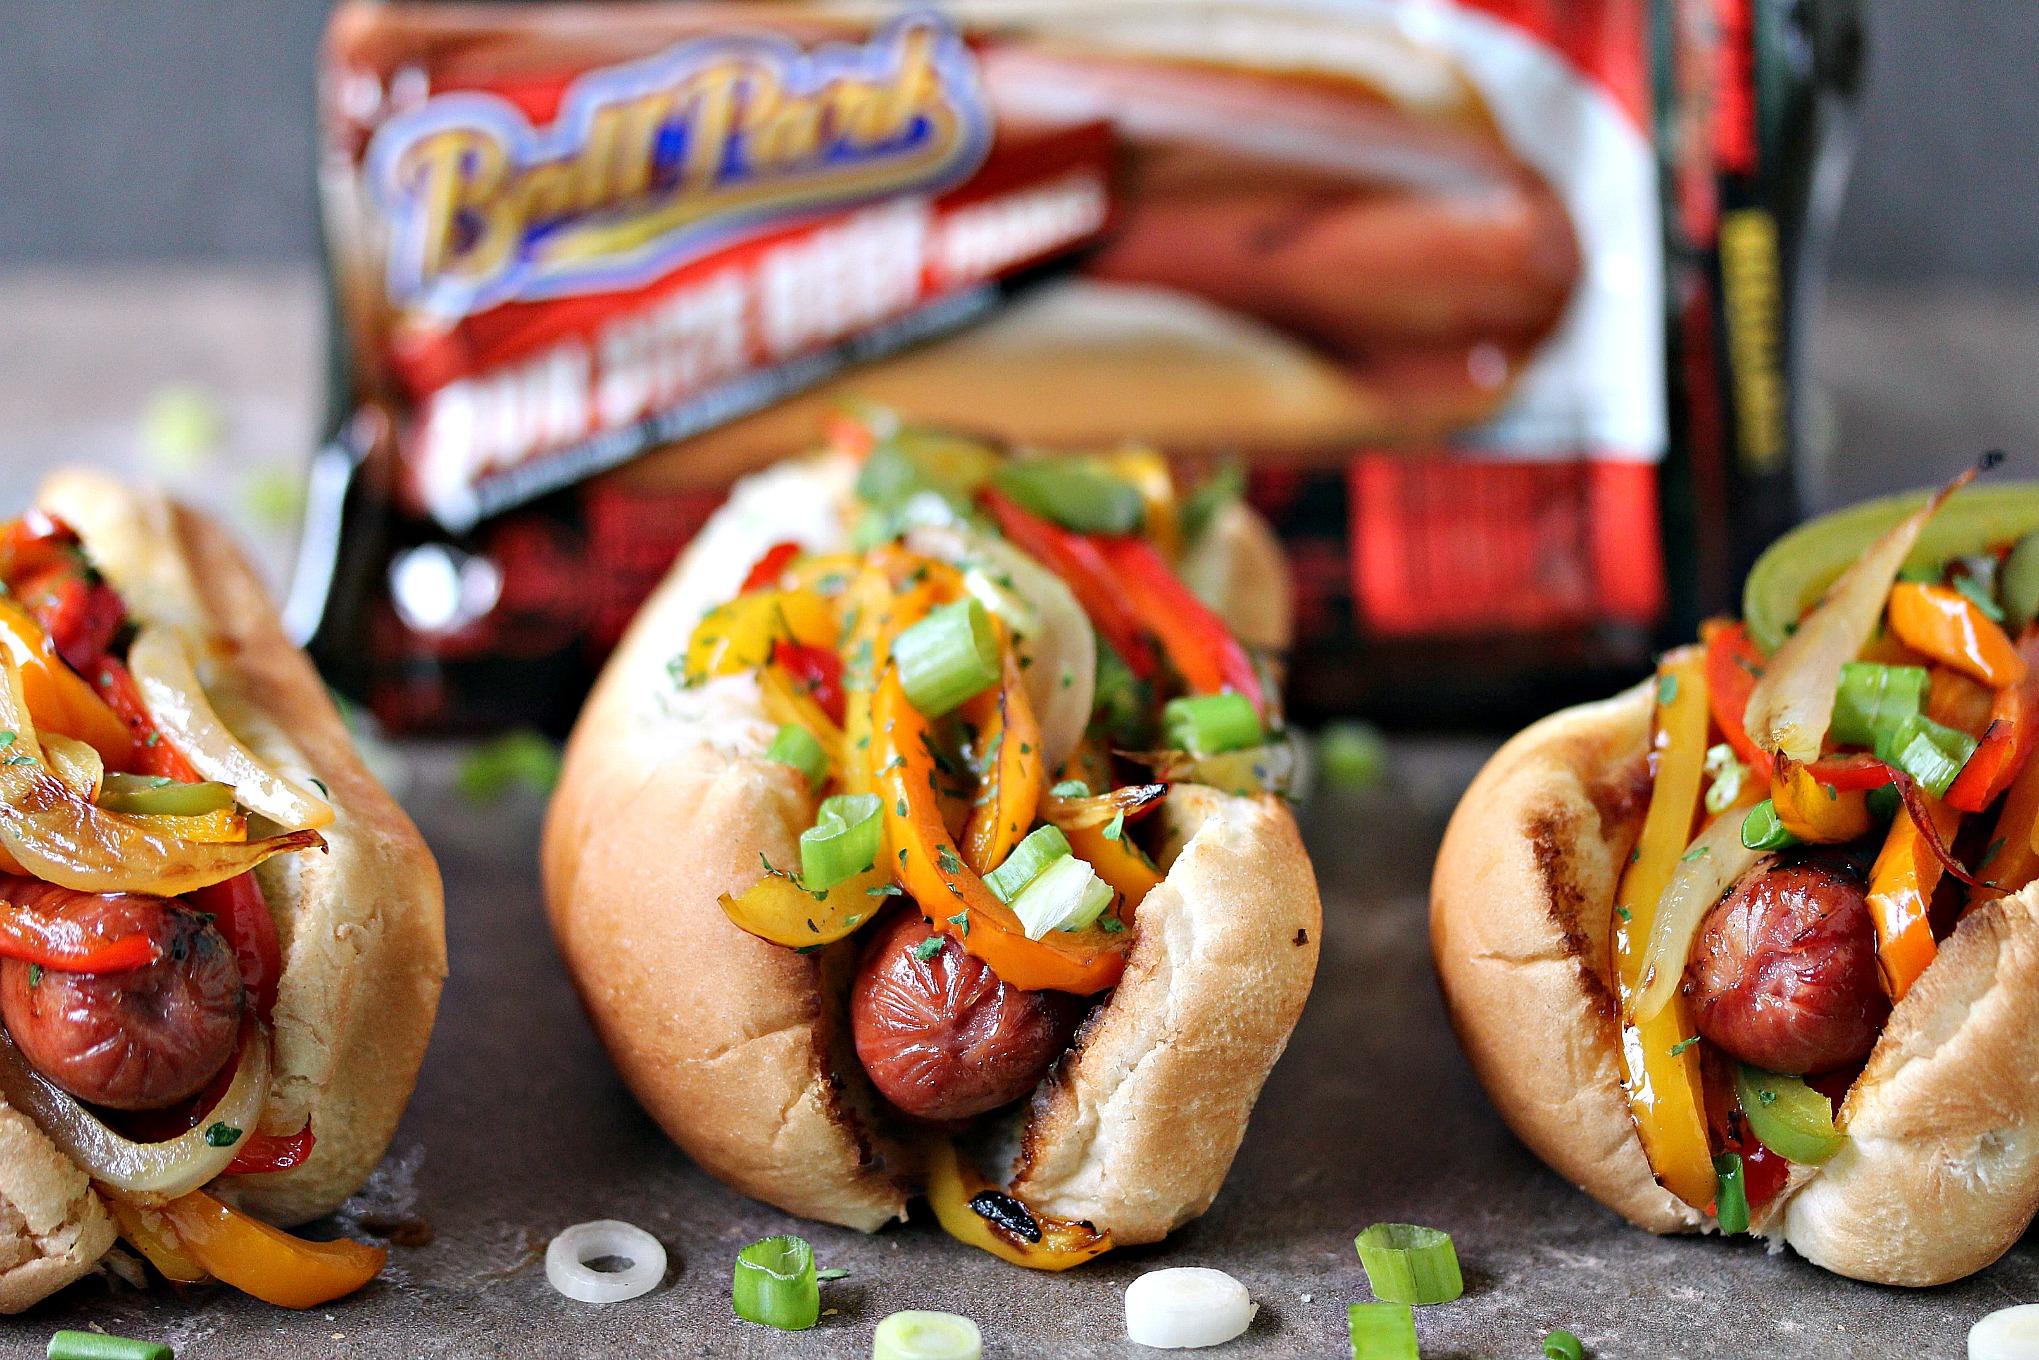 Fajita Hot Dogs : Grilled Fajita Hot Dogs 8 from www.cravingsofalunatic.com size 2039 x 1360 jpeg 943kB